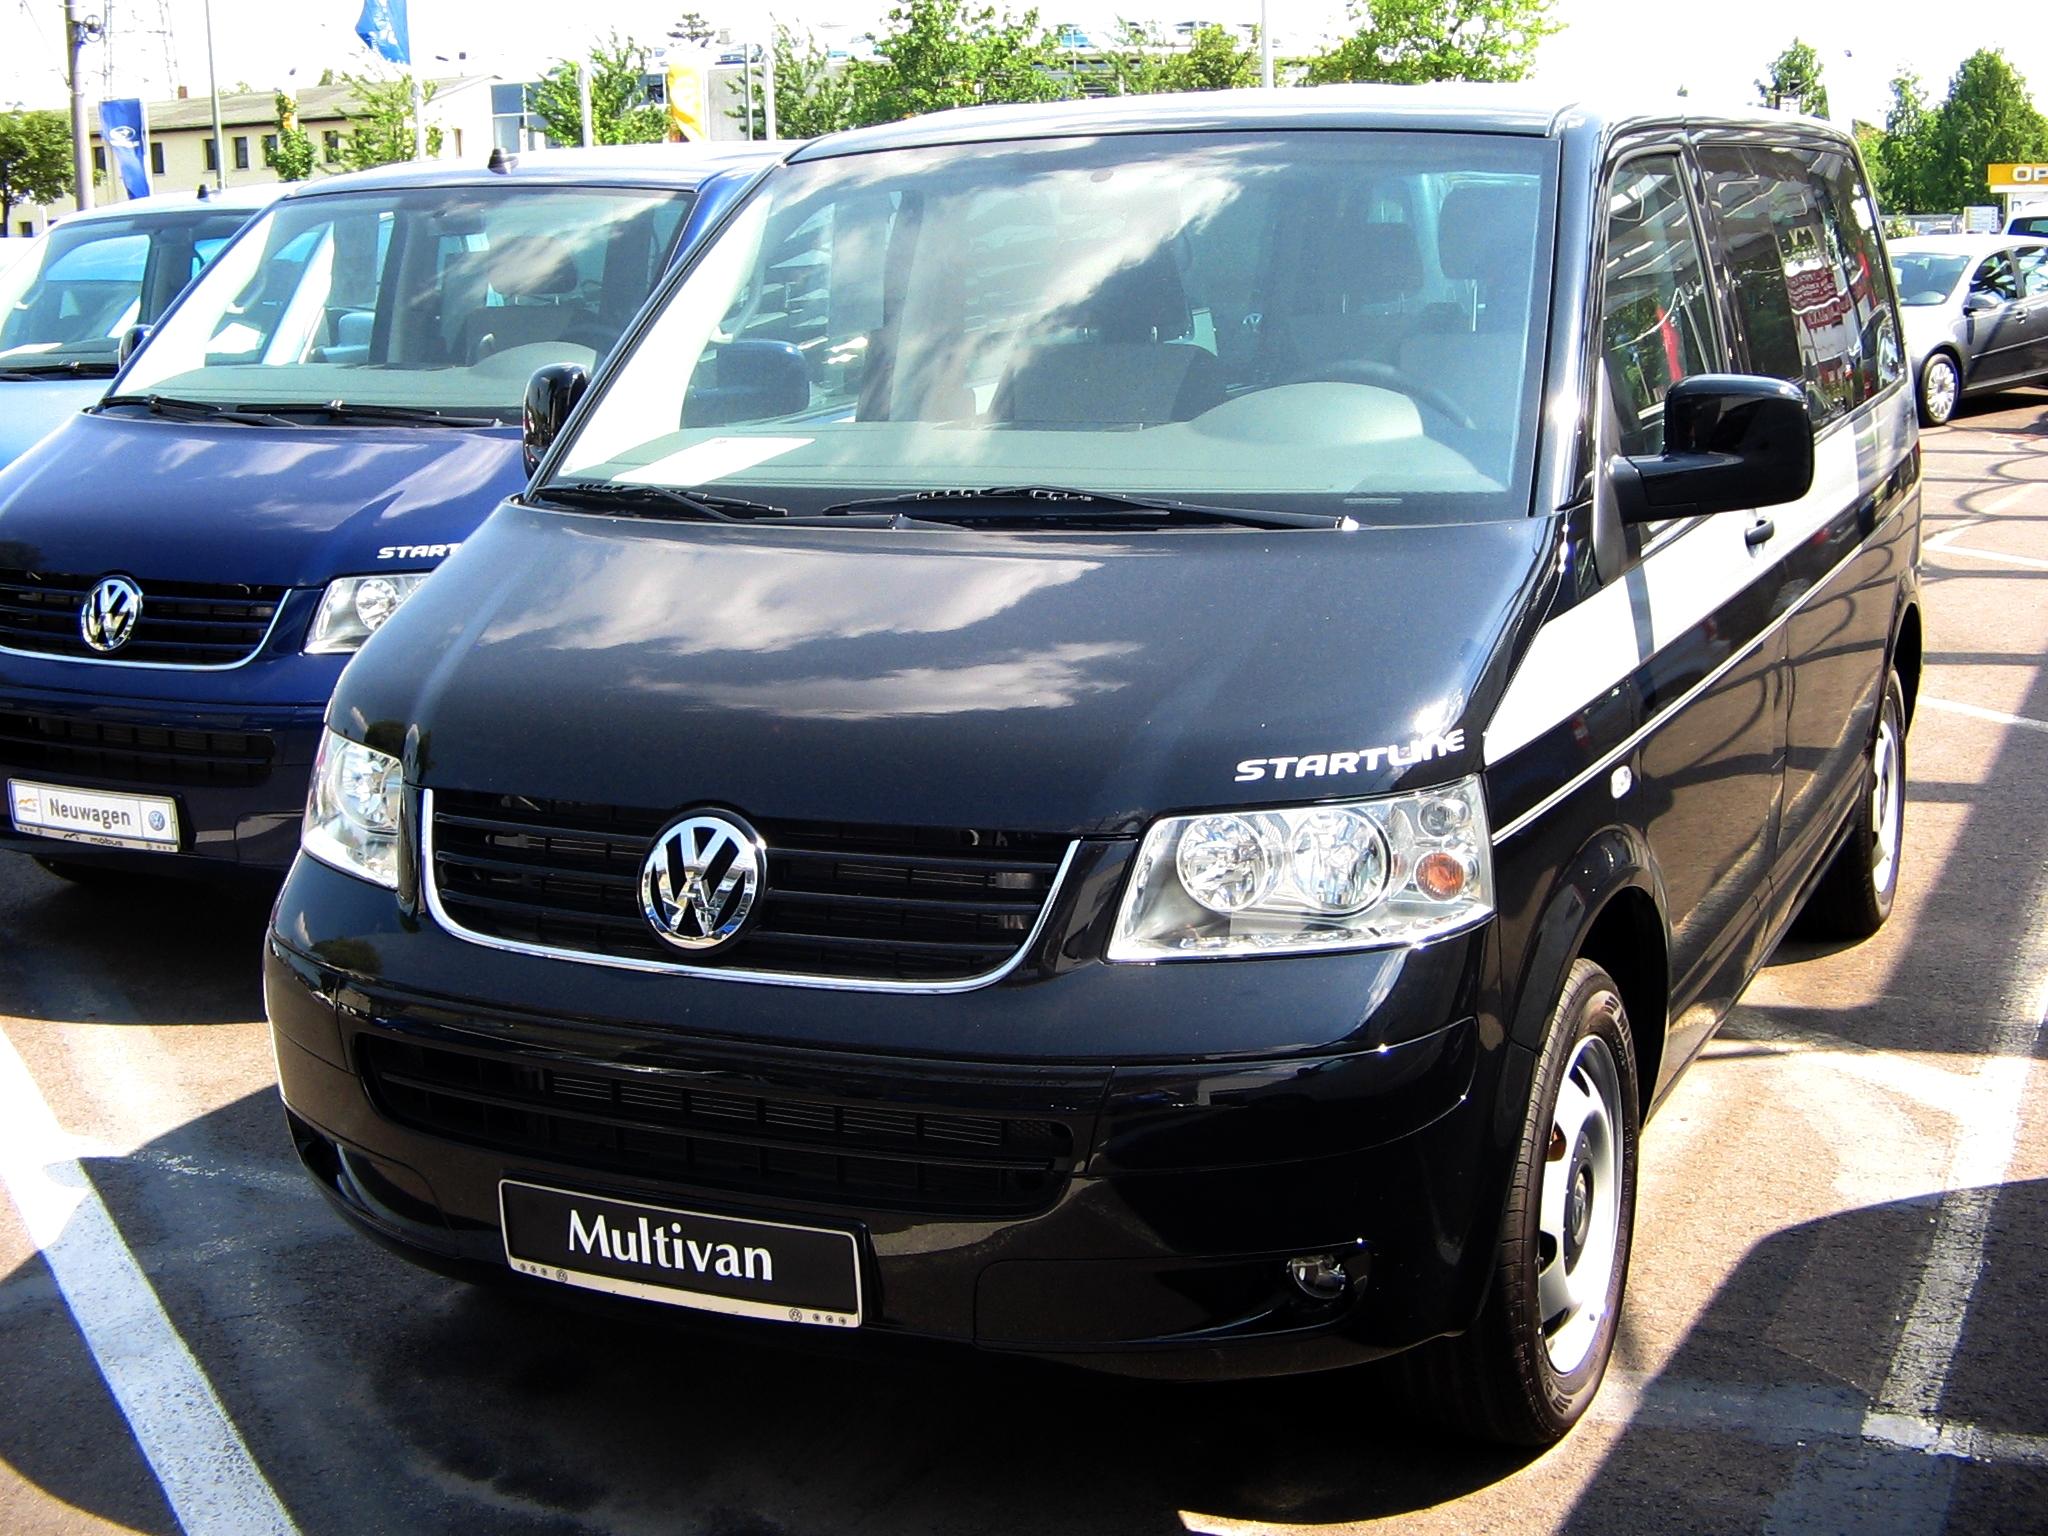 Mercedes Work Van >> File:Multivan Startline.jpg - Wikimedia Commons